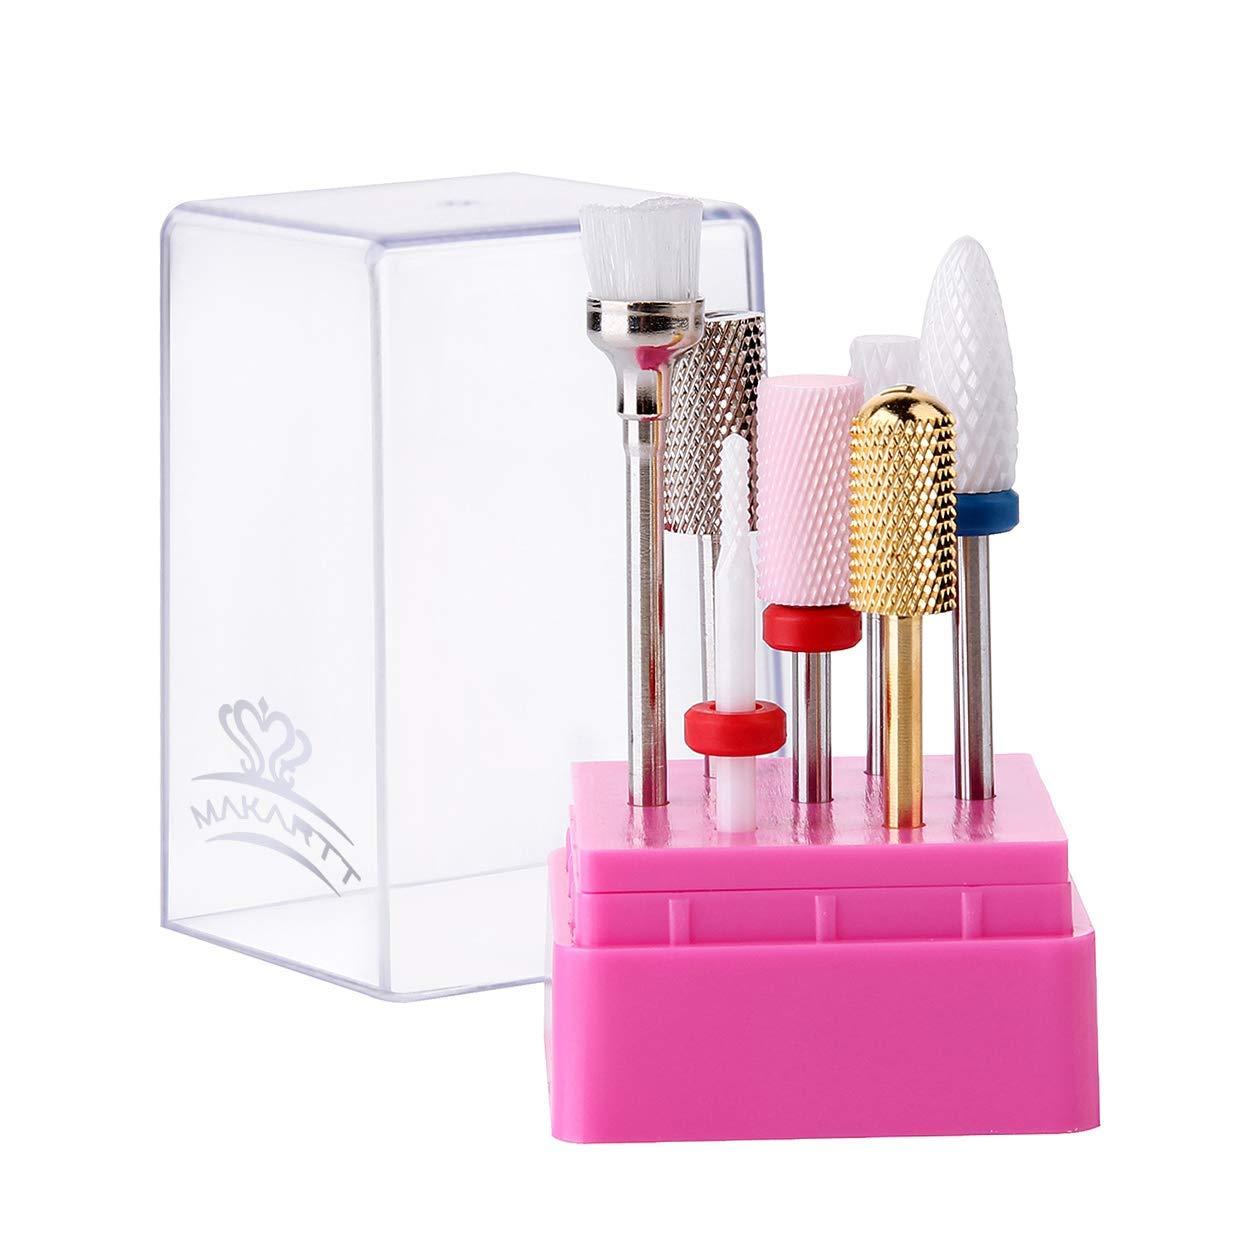 Makartt Nail Drill Bit Set 7PCS Rem Safety 5 ☆ very popular Sale Special Price Bits 3 32